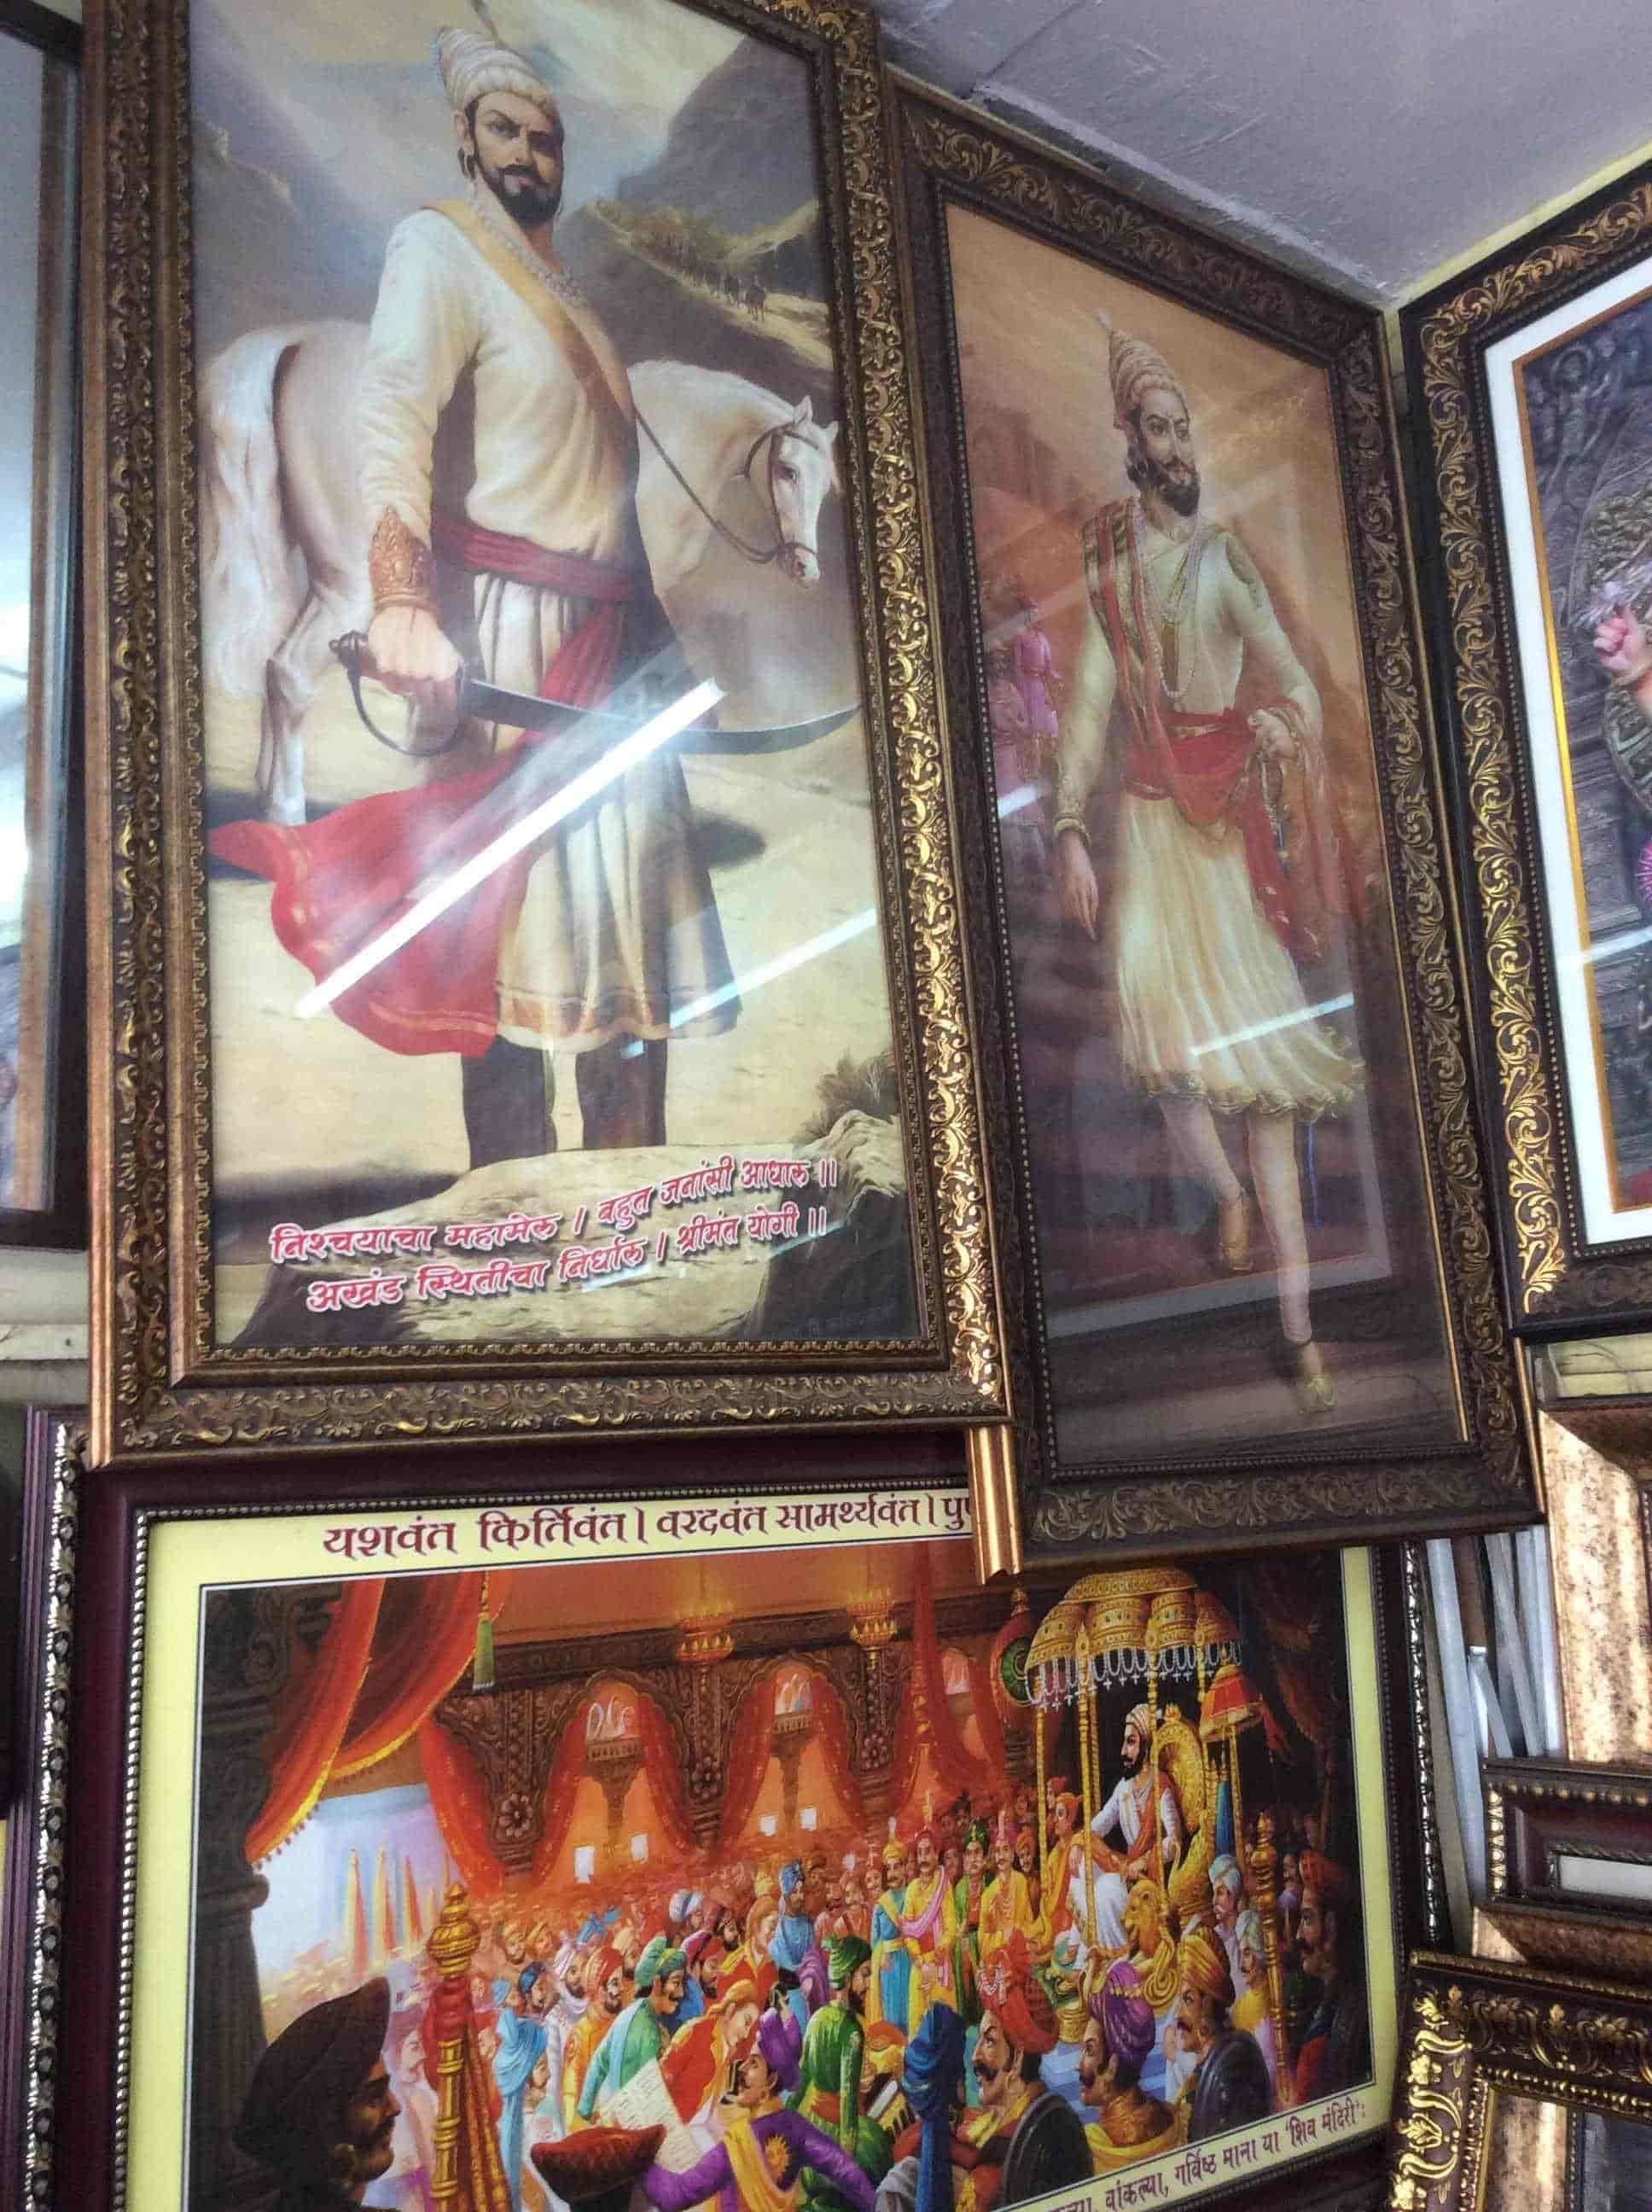 Ambika Frame Makers Photos, Kala Chowki, Mumbai- Pictures & Images ...